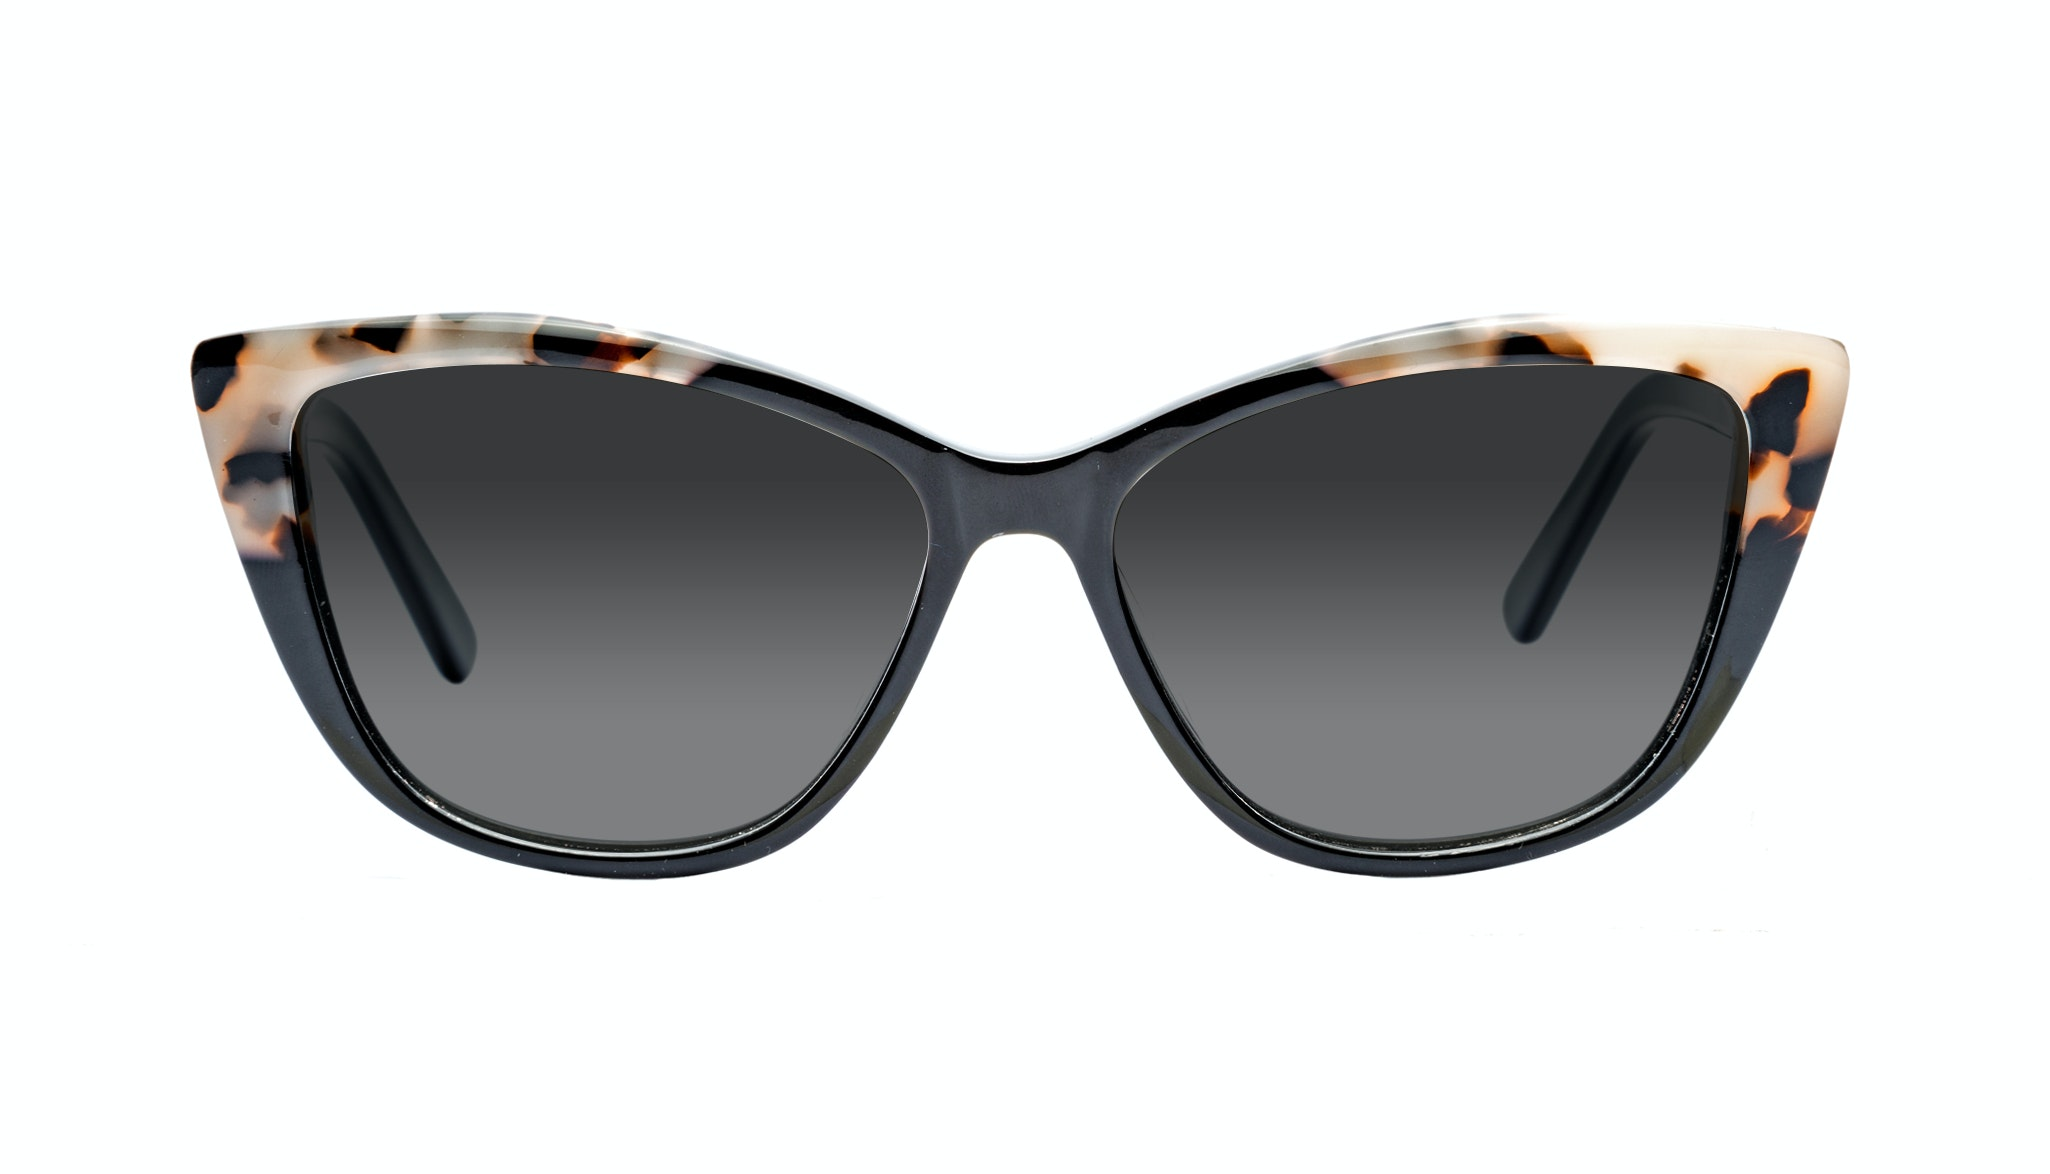 Affordable Fashion Glasses Cat Eye Daring Cateye Sunglasses Women Dolled Up Ebony Granite Front